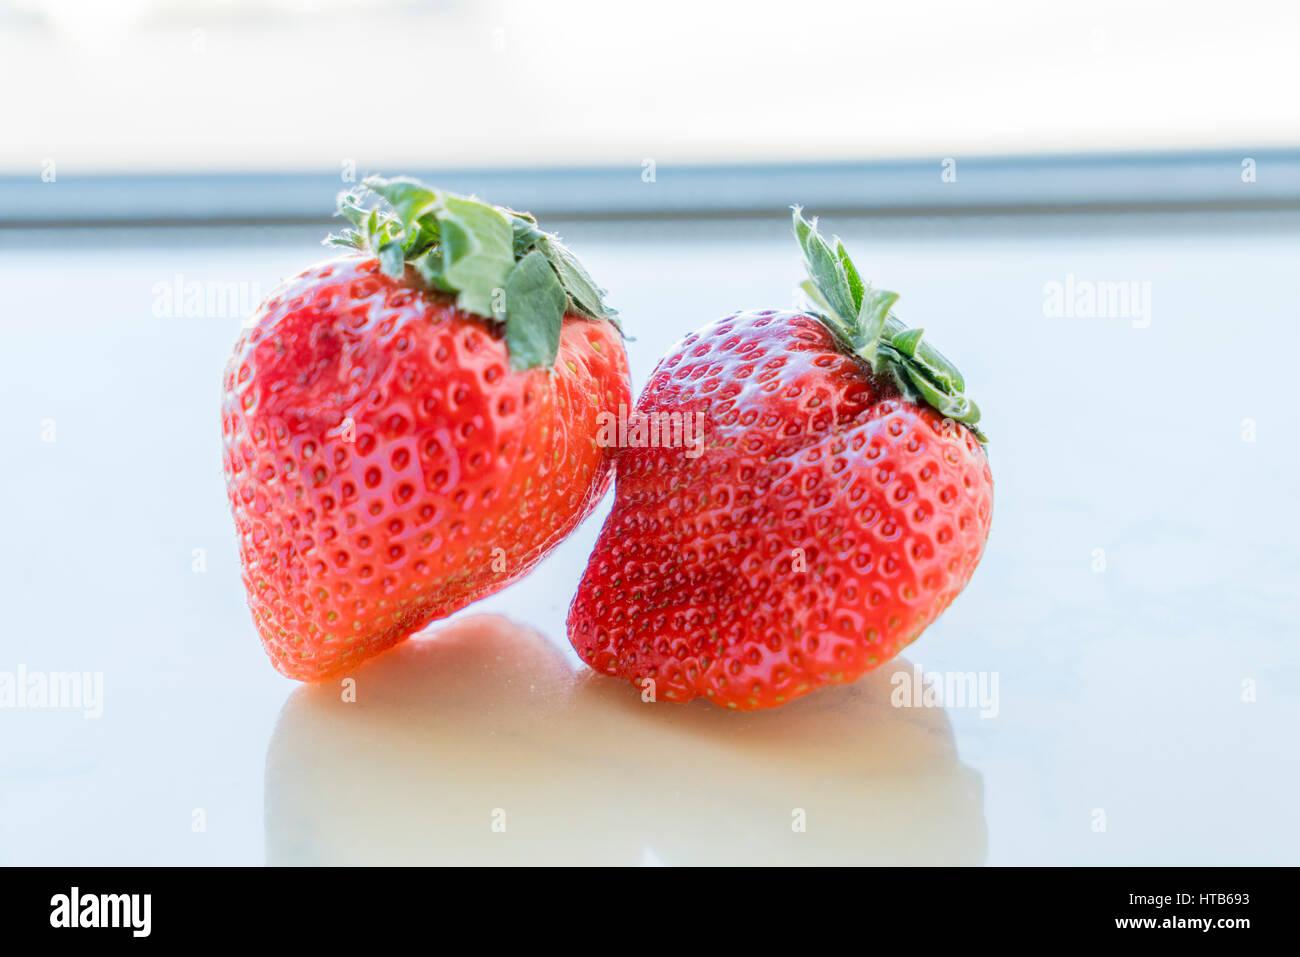 Close up of fresh strawberries on white background - Stock Photo